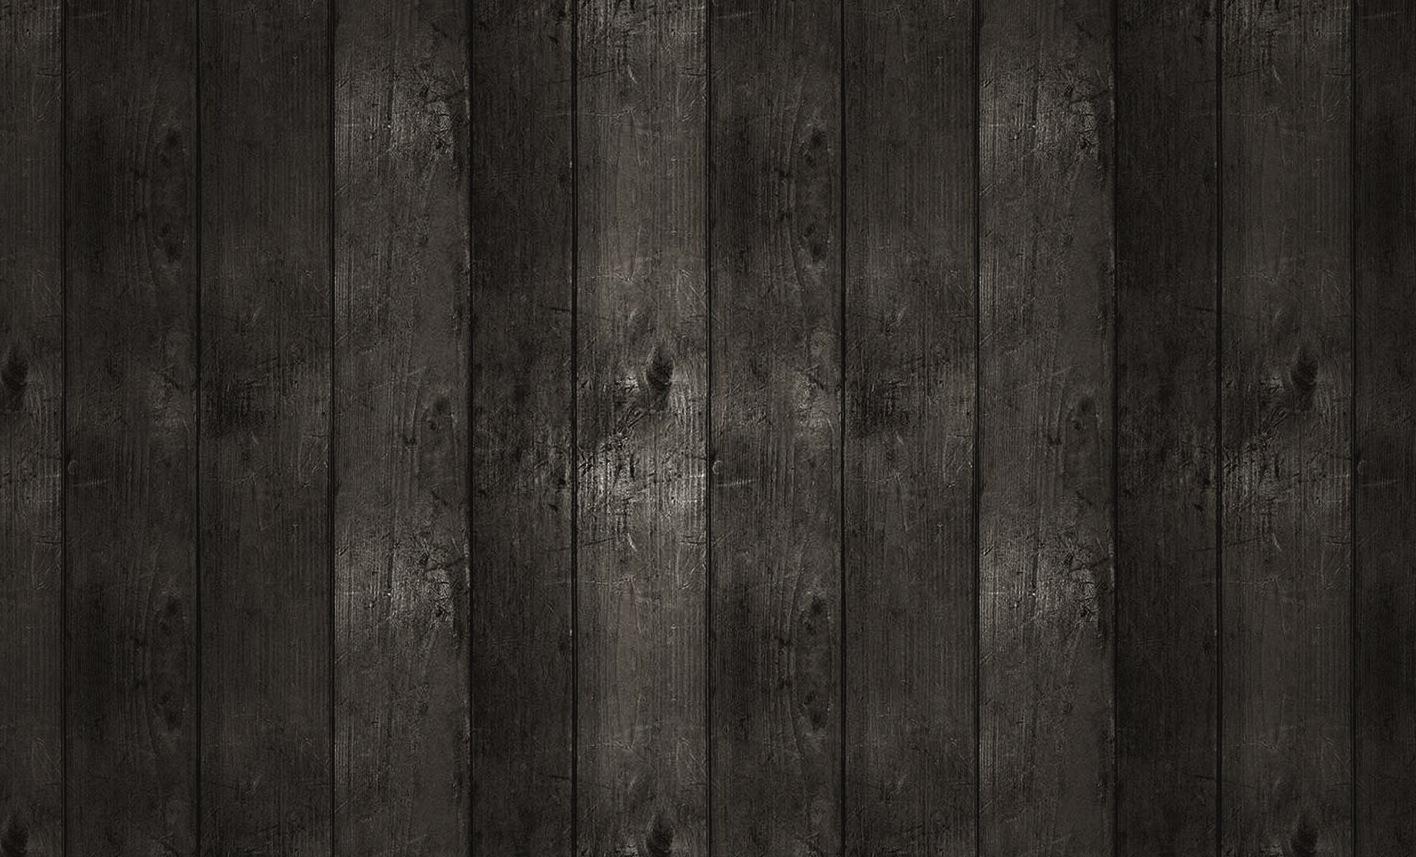 wallpapersrusticwoodbackgroundsforgtbrownwood